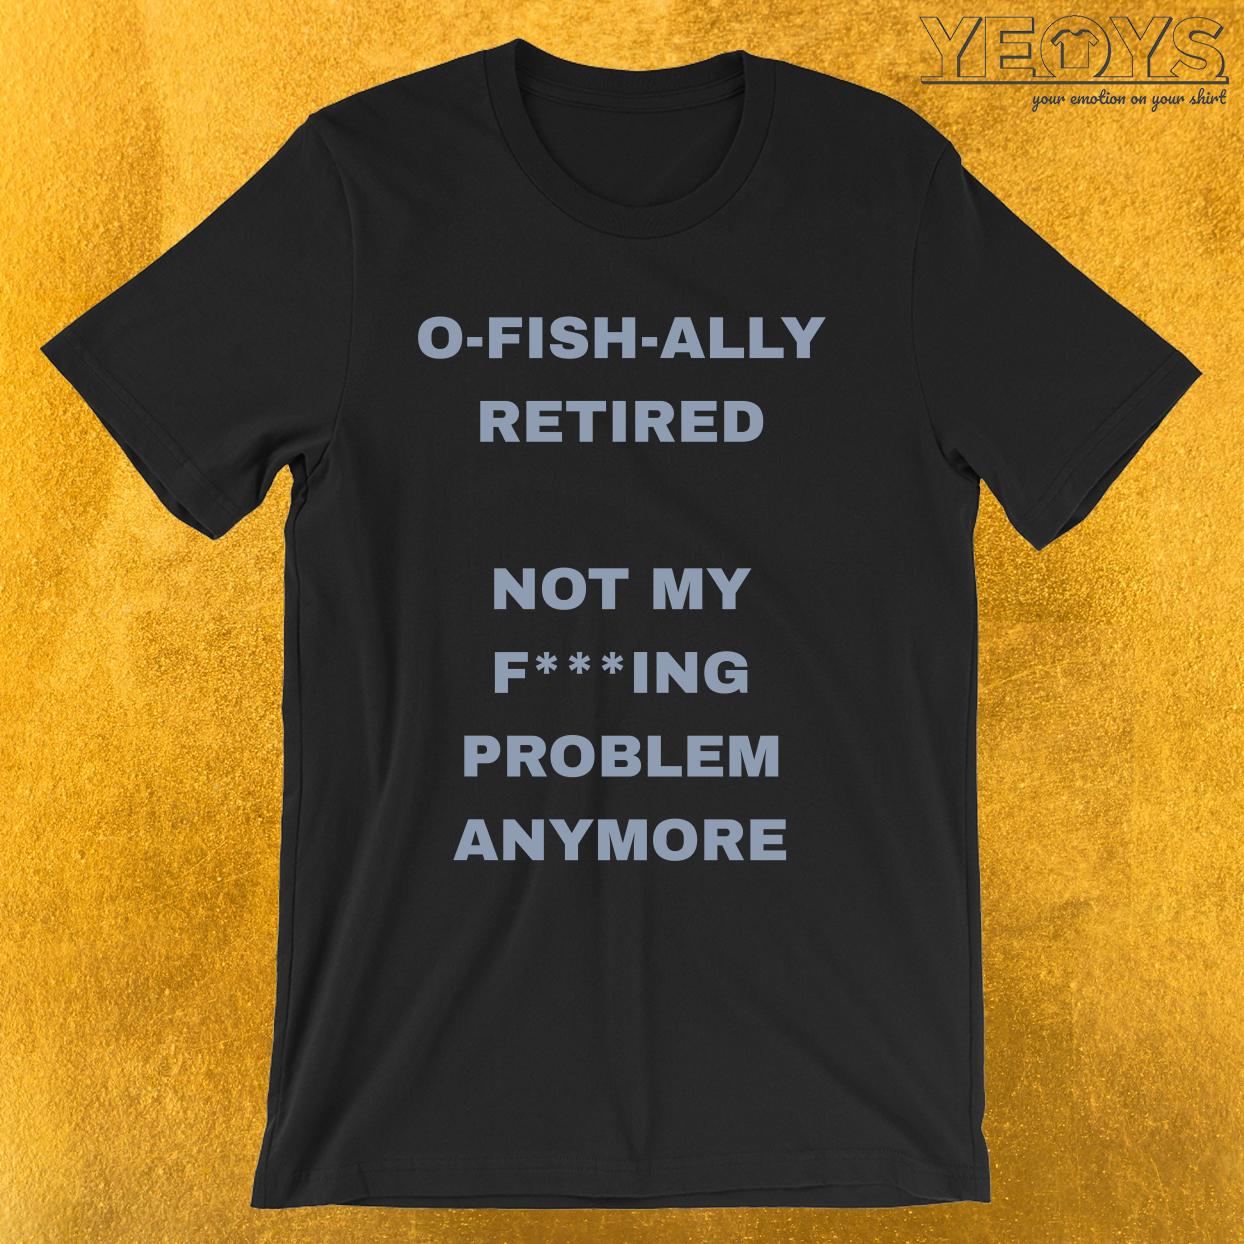 O-Fish-Ally Retired – Old Fisherman Tee